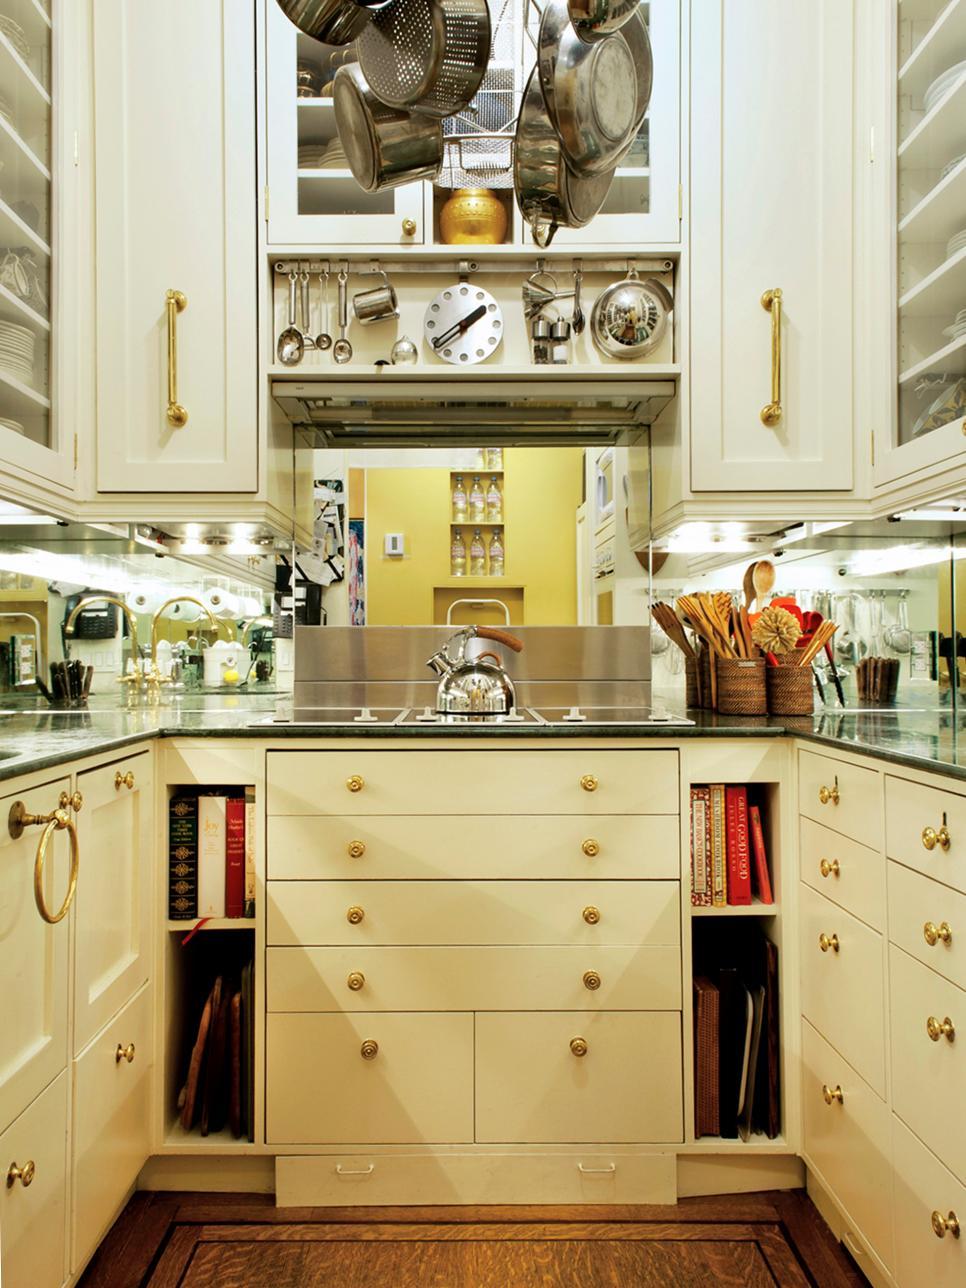 Kitchen Chandeliers, Pendants And Under-Cabinet Lighting